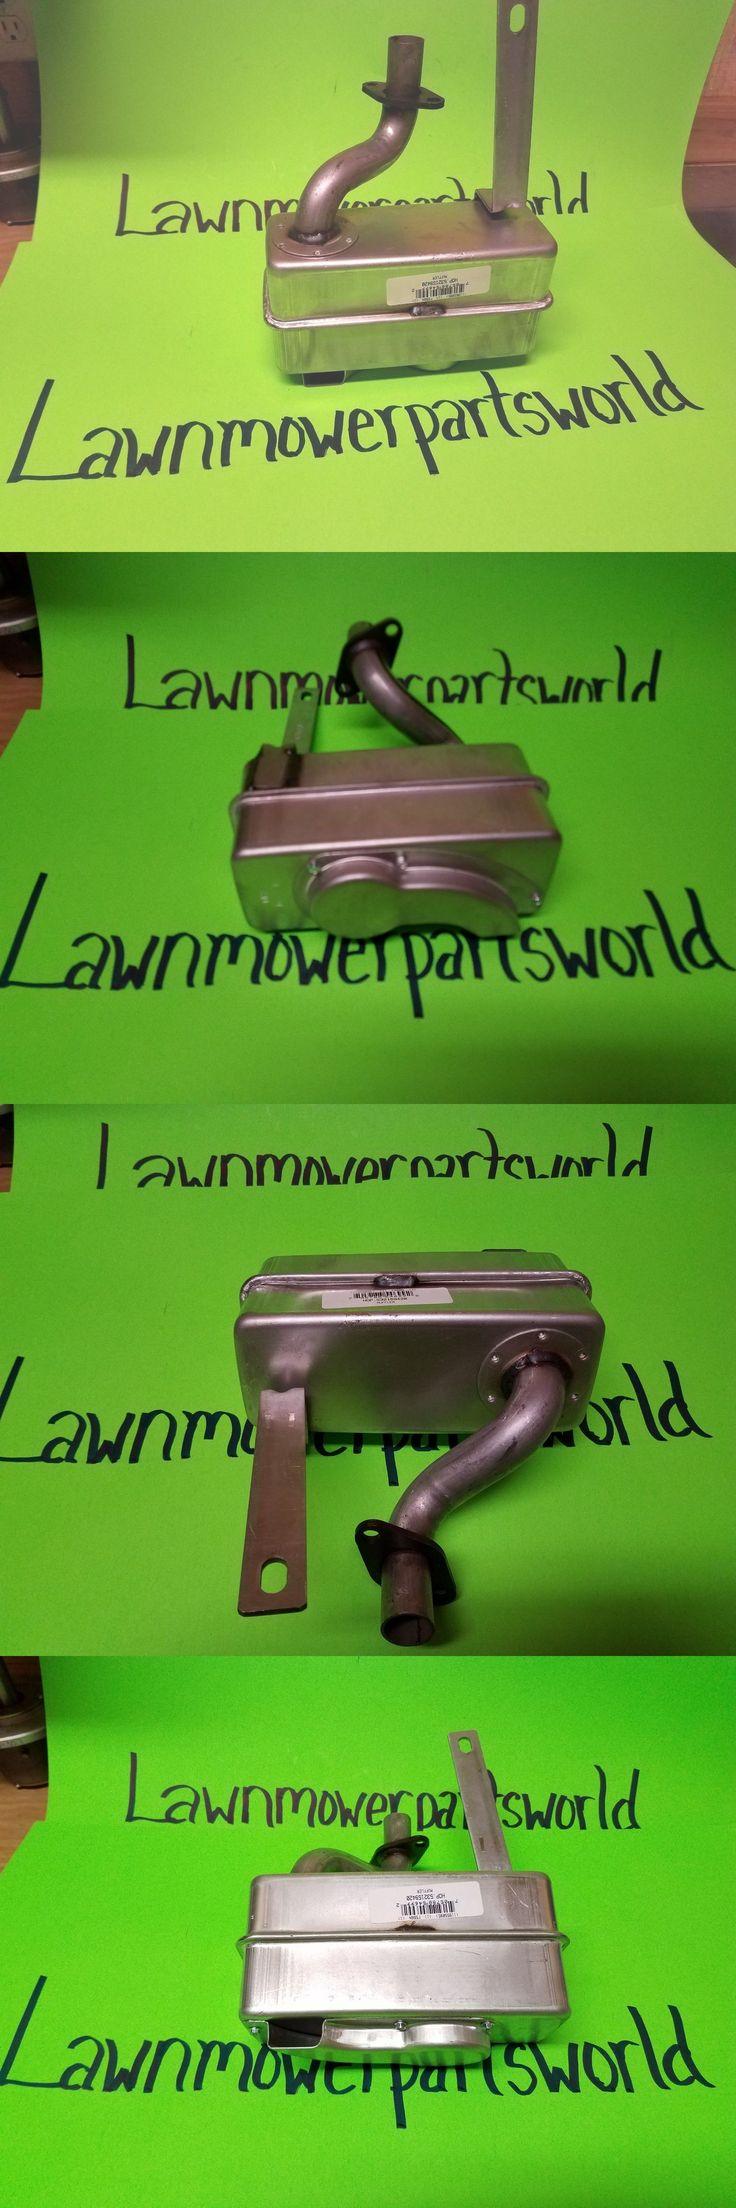 Parts and Accessories 82248: Craftsman Husqvarna Poulan Mower Kohler Engine Muffler 159420 532159420 Oem New -> BUY IT NOW ONLY: $59.5 on eBay!